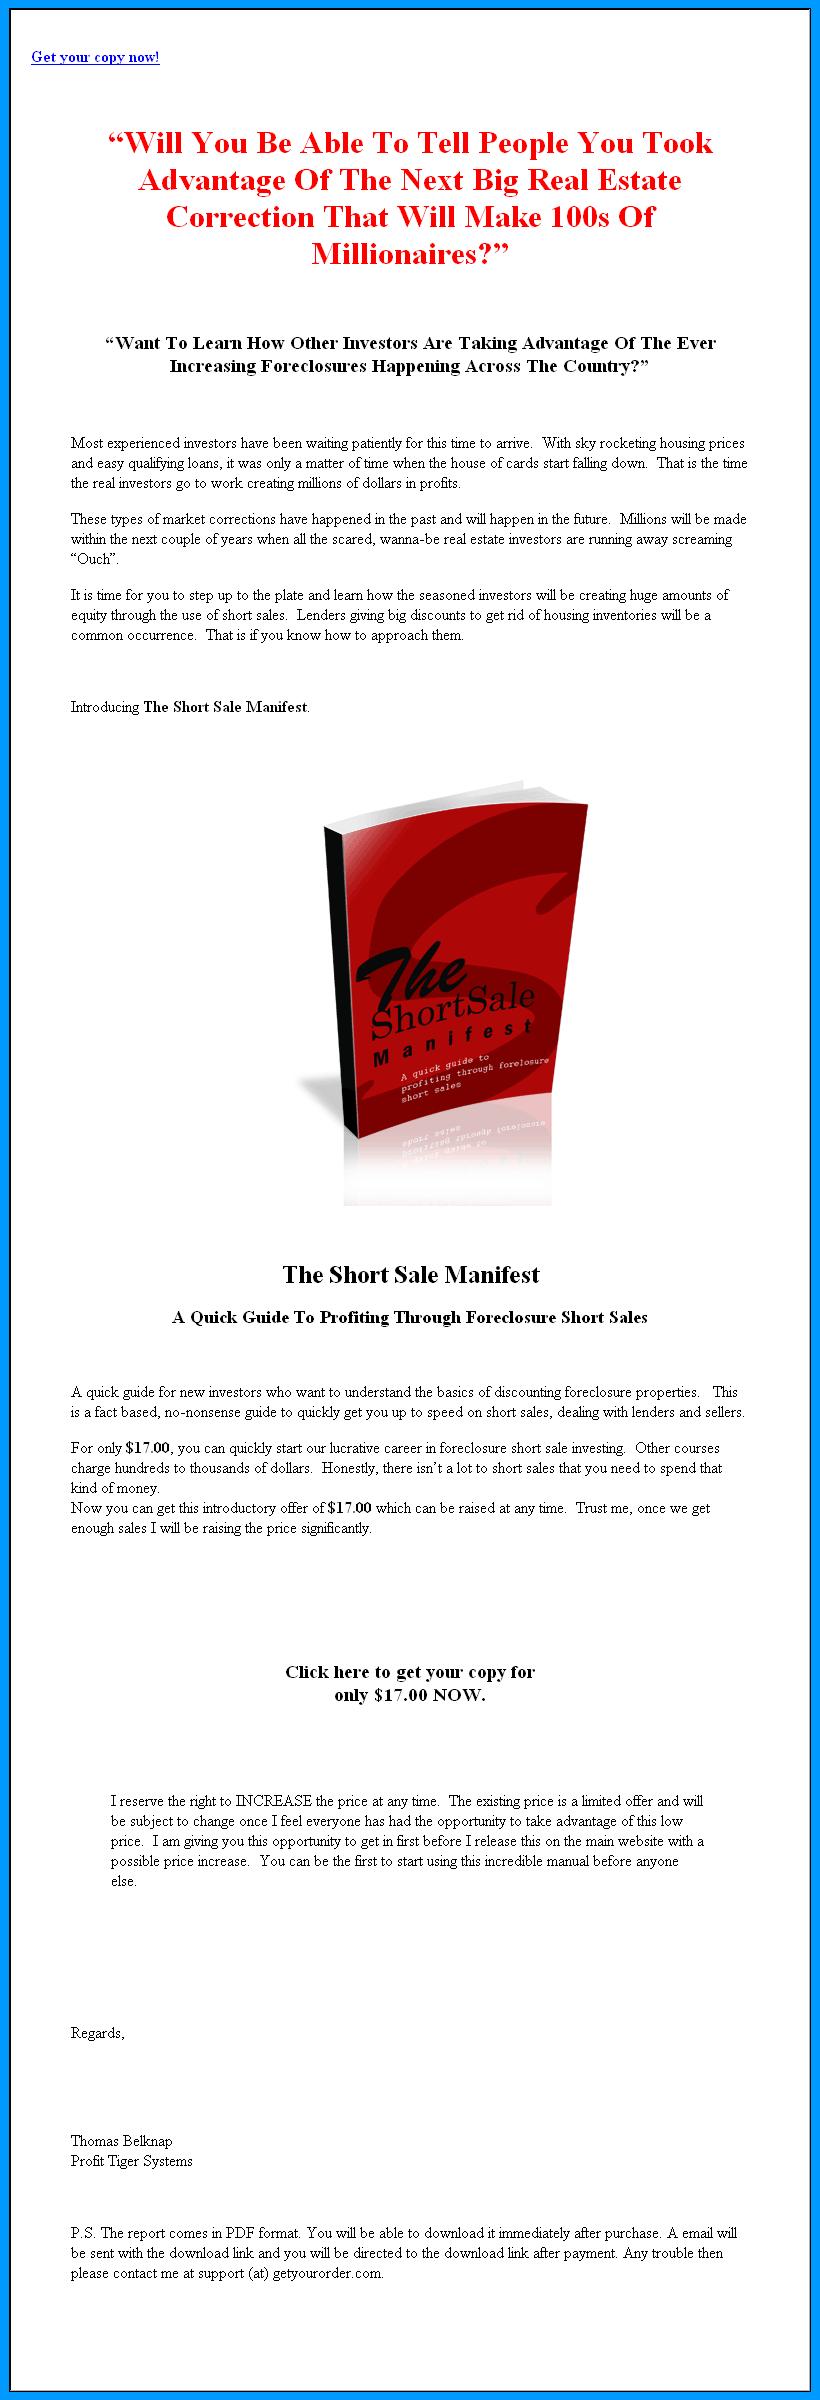 Short sale manifest mrr ebook foreclosure 699 thecheapjerseys Gallery